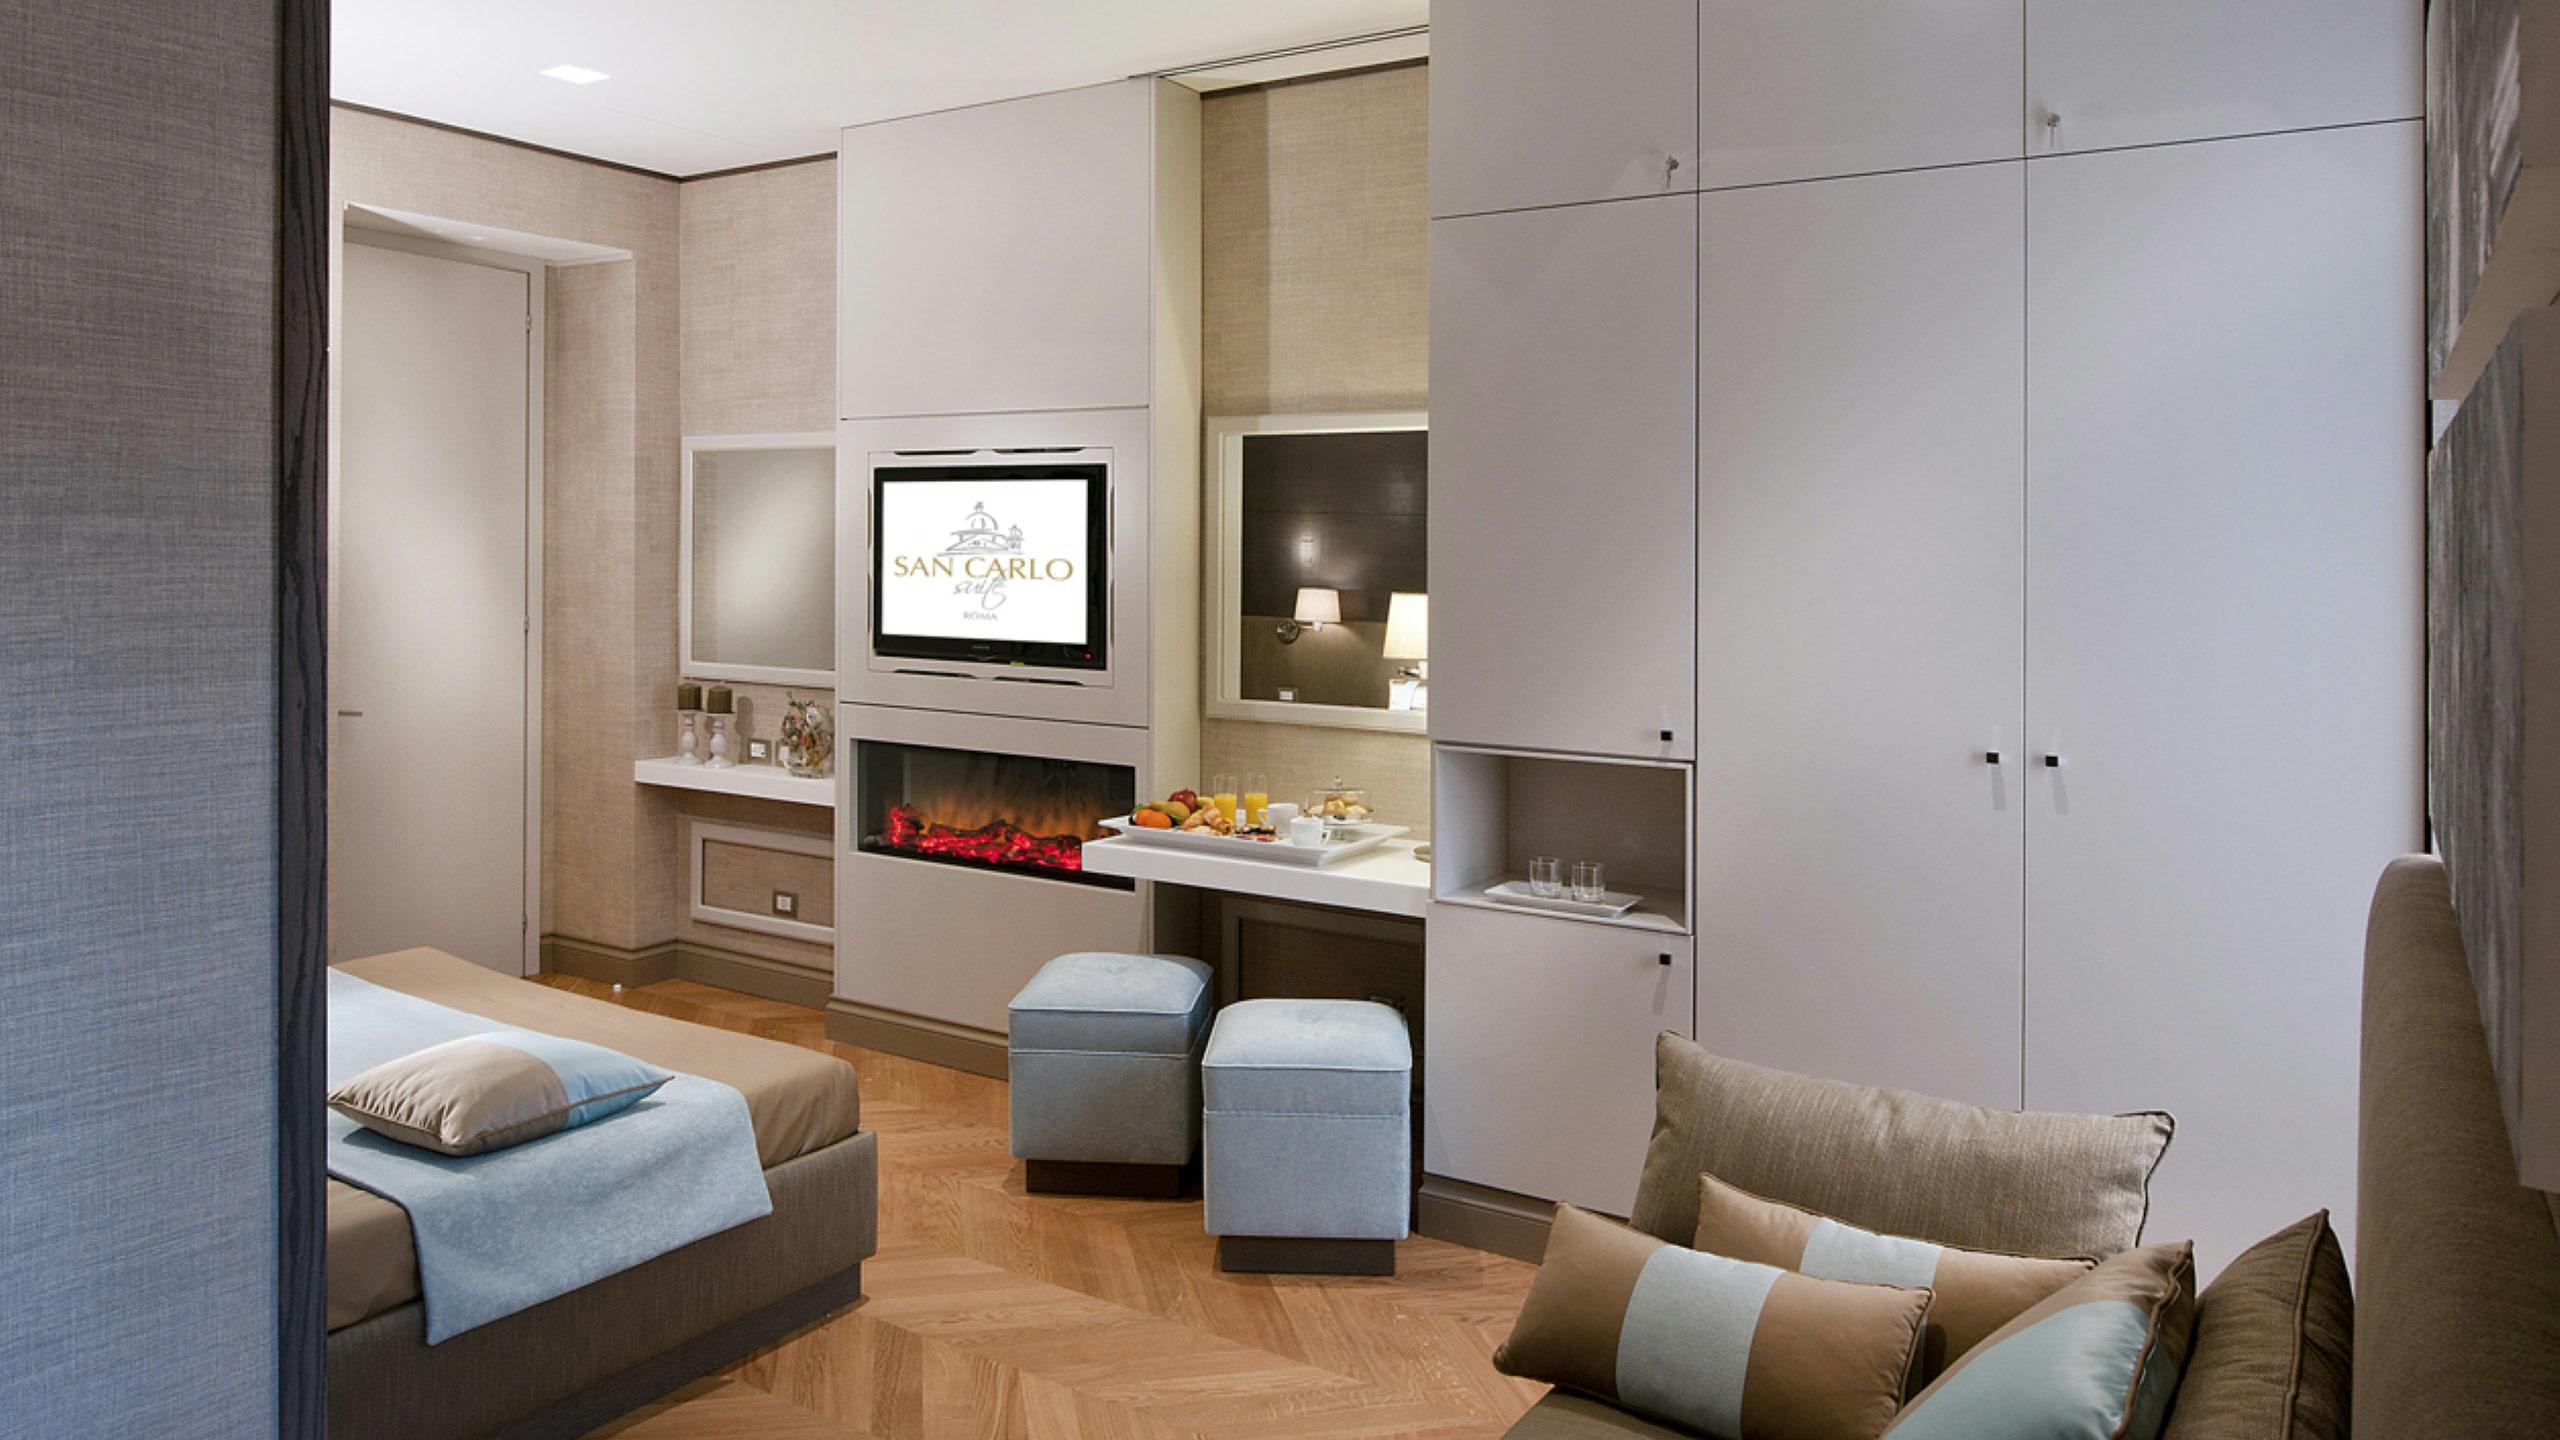 San-Carlo-Suite-Roma-suite-deluxe-salone